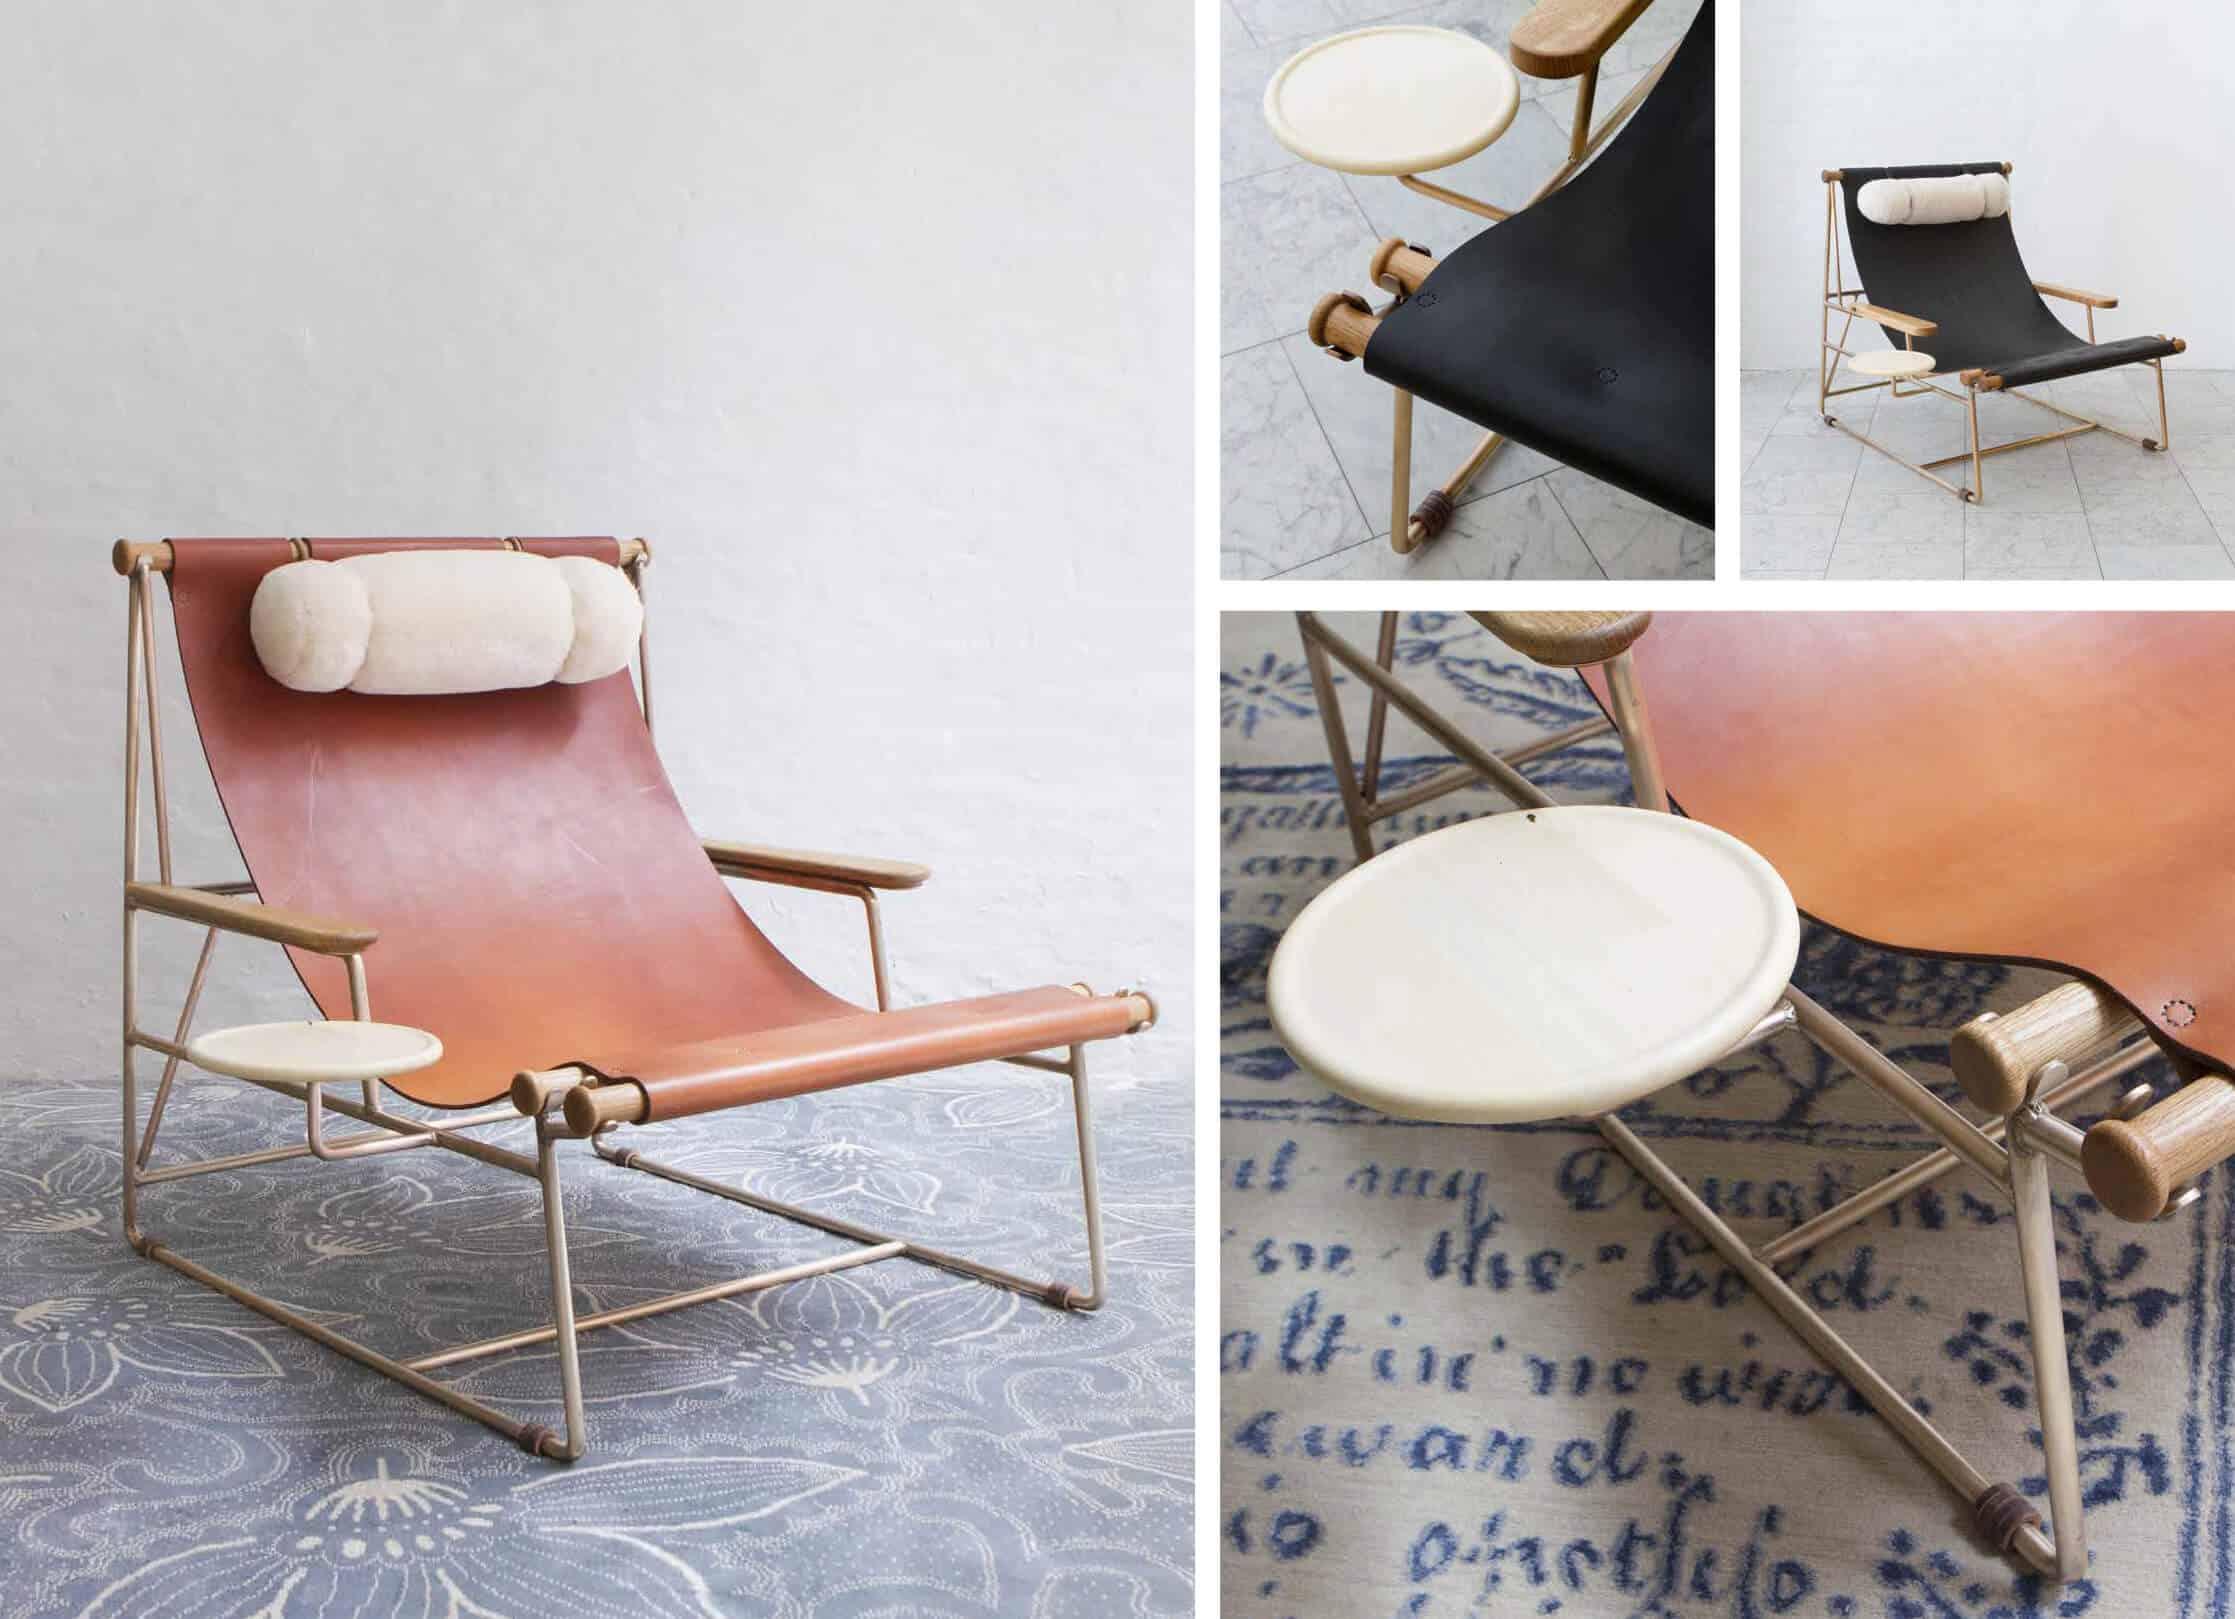 emily henderson_furniture_bddw-deck-chair